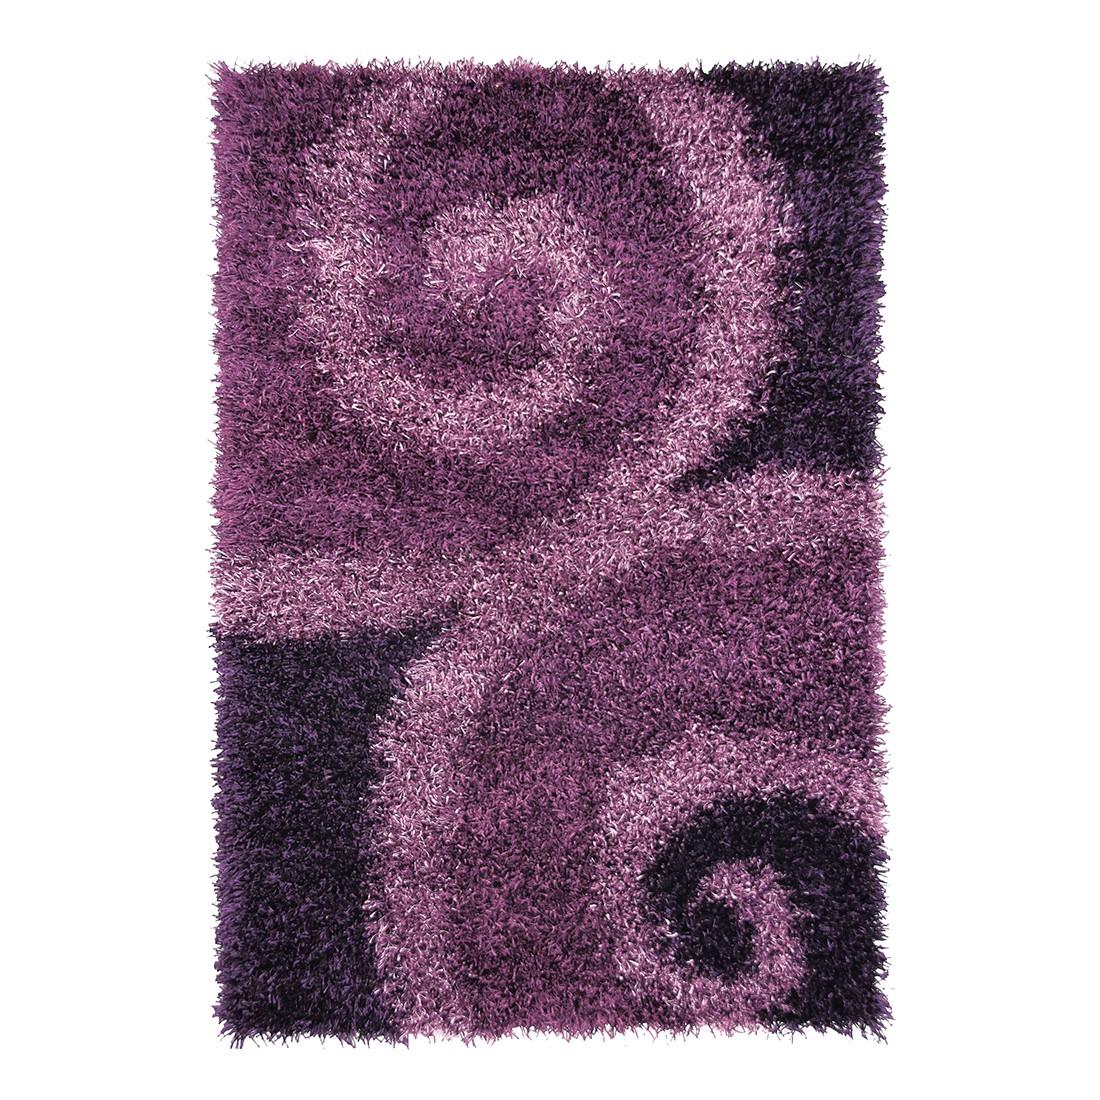 Teppich Lavella 80 - Violett - 200 x 300 cm, Luxor living